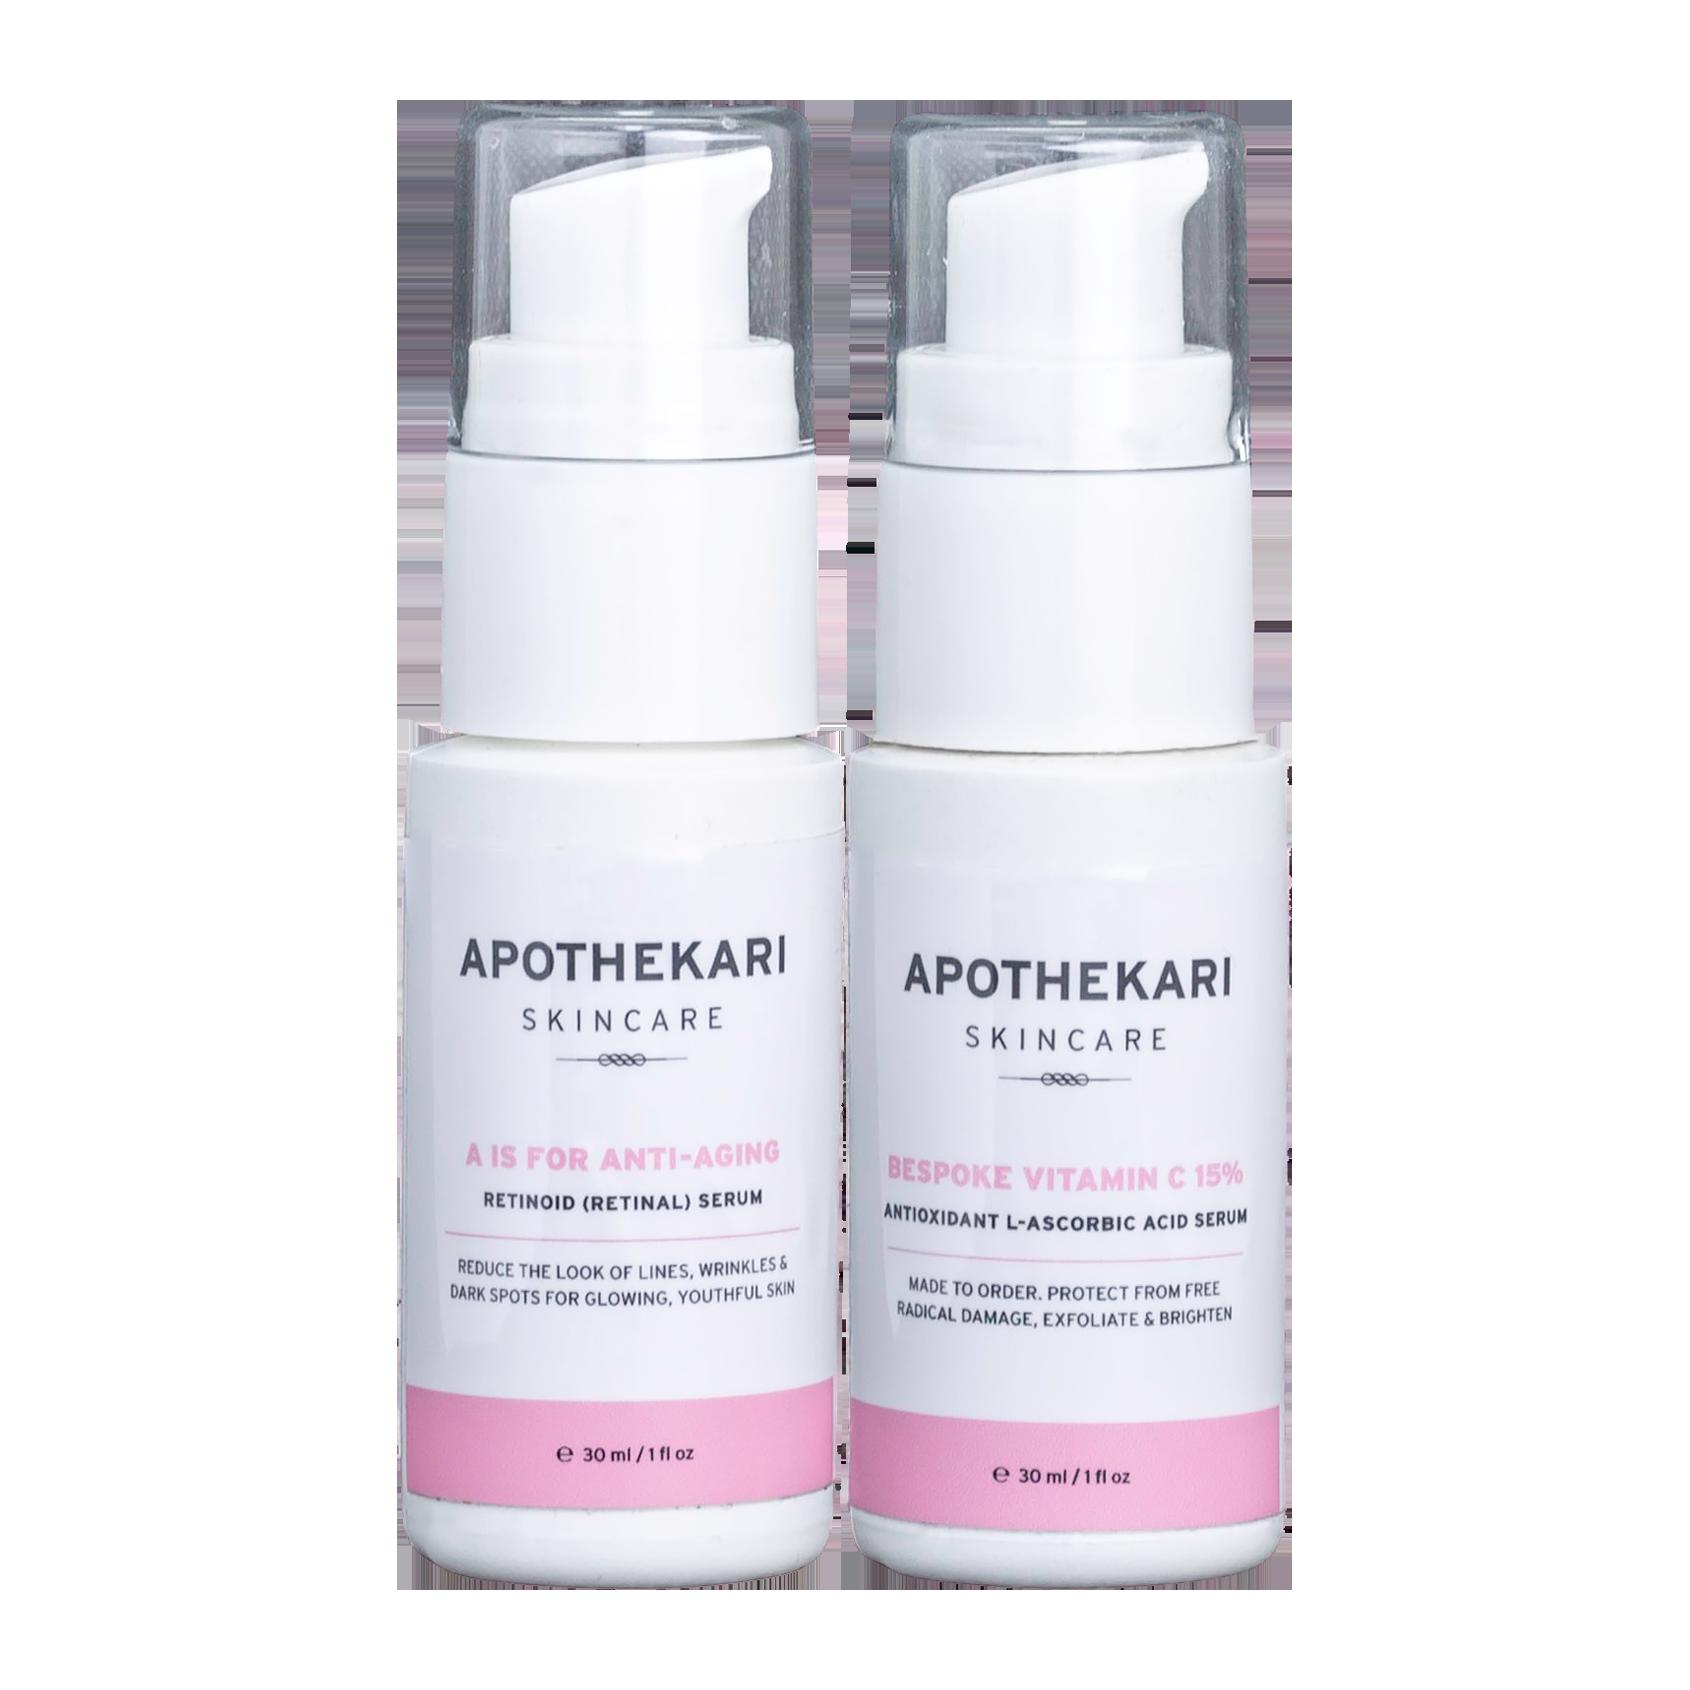 Radiant-Skin-Set-Apothekari-Skincare